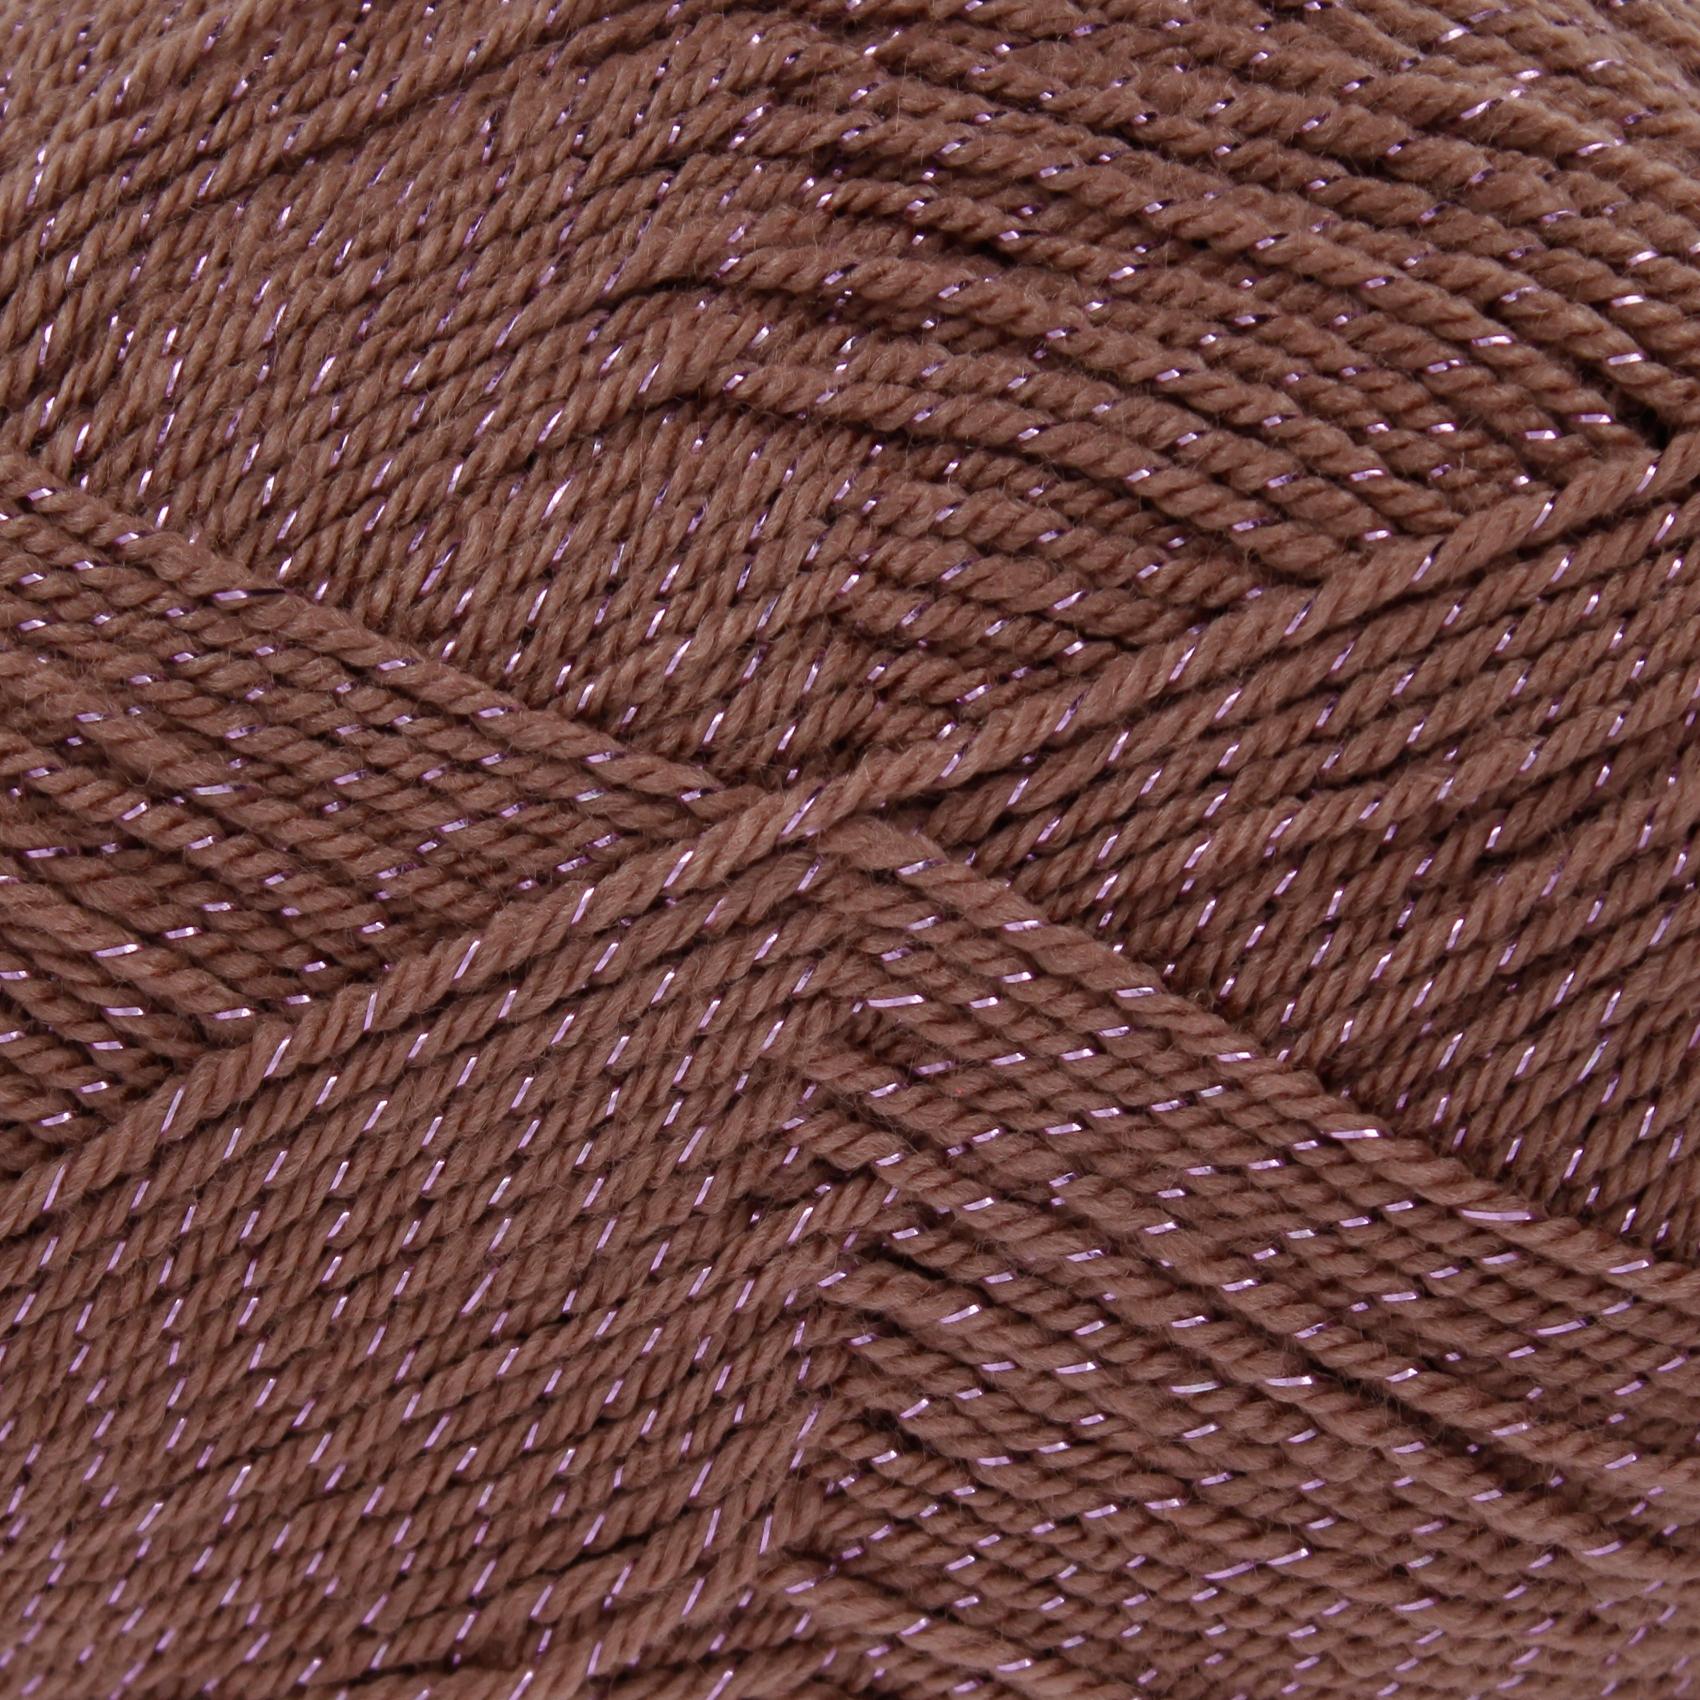 Knitting Wool Uk Only : King cole glitz dk double knitting yarn soft premium